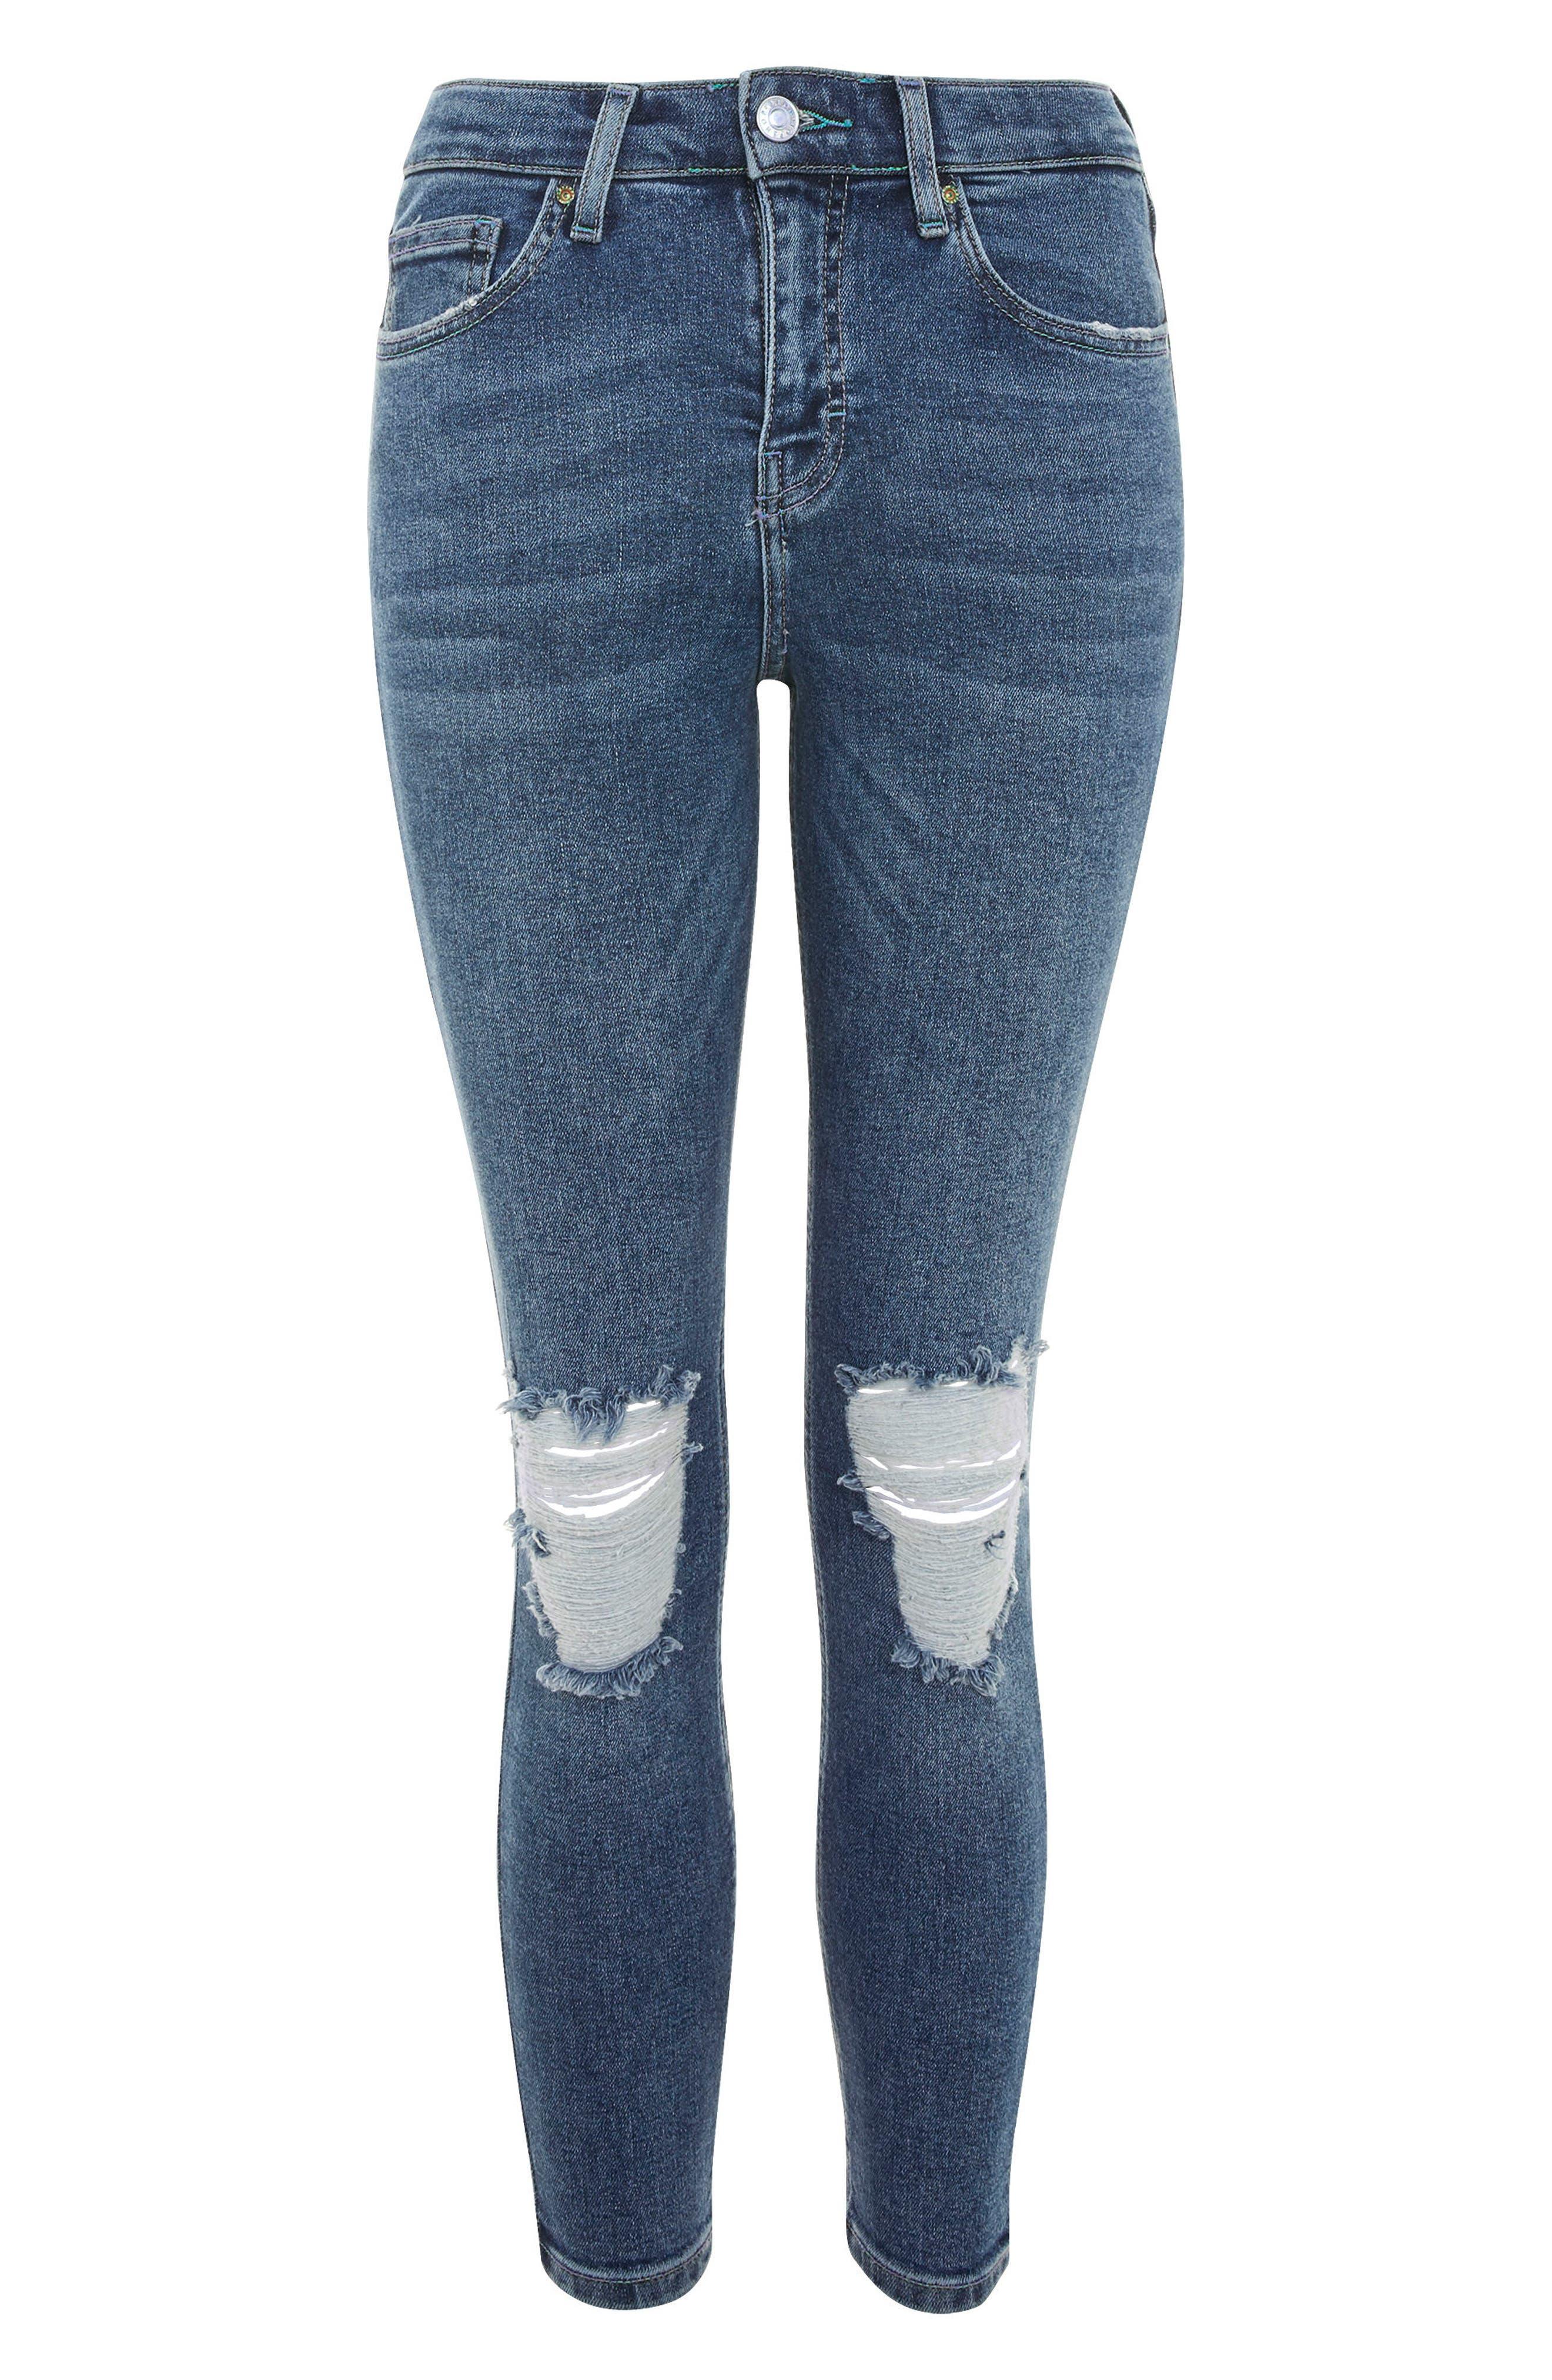 Jamie Petite Ripped Jeans,                             Alternate thumbnail 4, color,                             Mid Denim